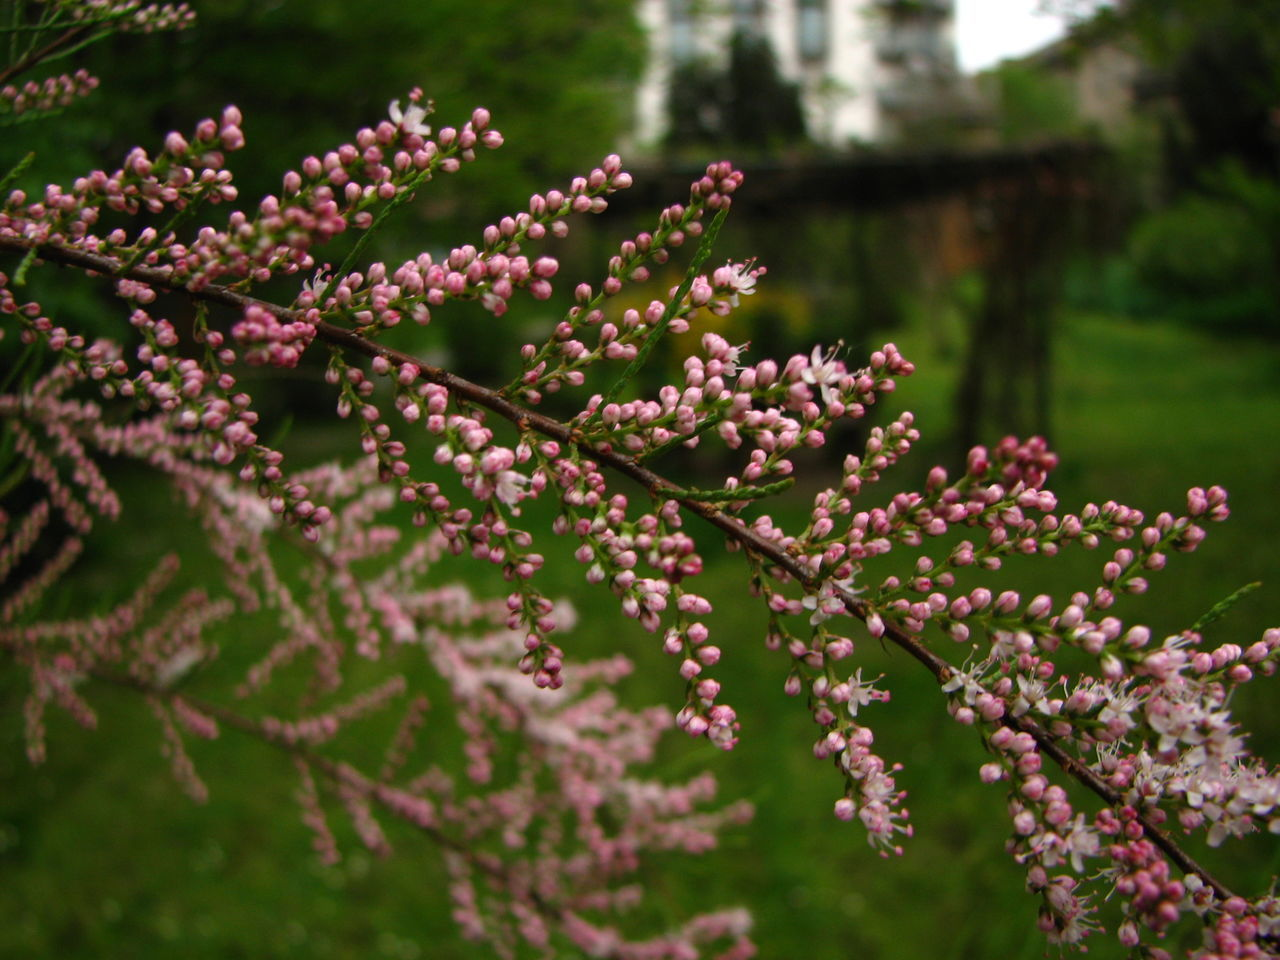 Bud Close-up Flower Focus On Foreground Outdoors Pink Color Plant Salt Cedar Springtime Tamarix Tamarix Tetrandra